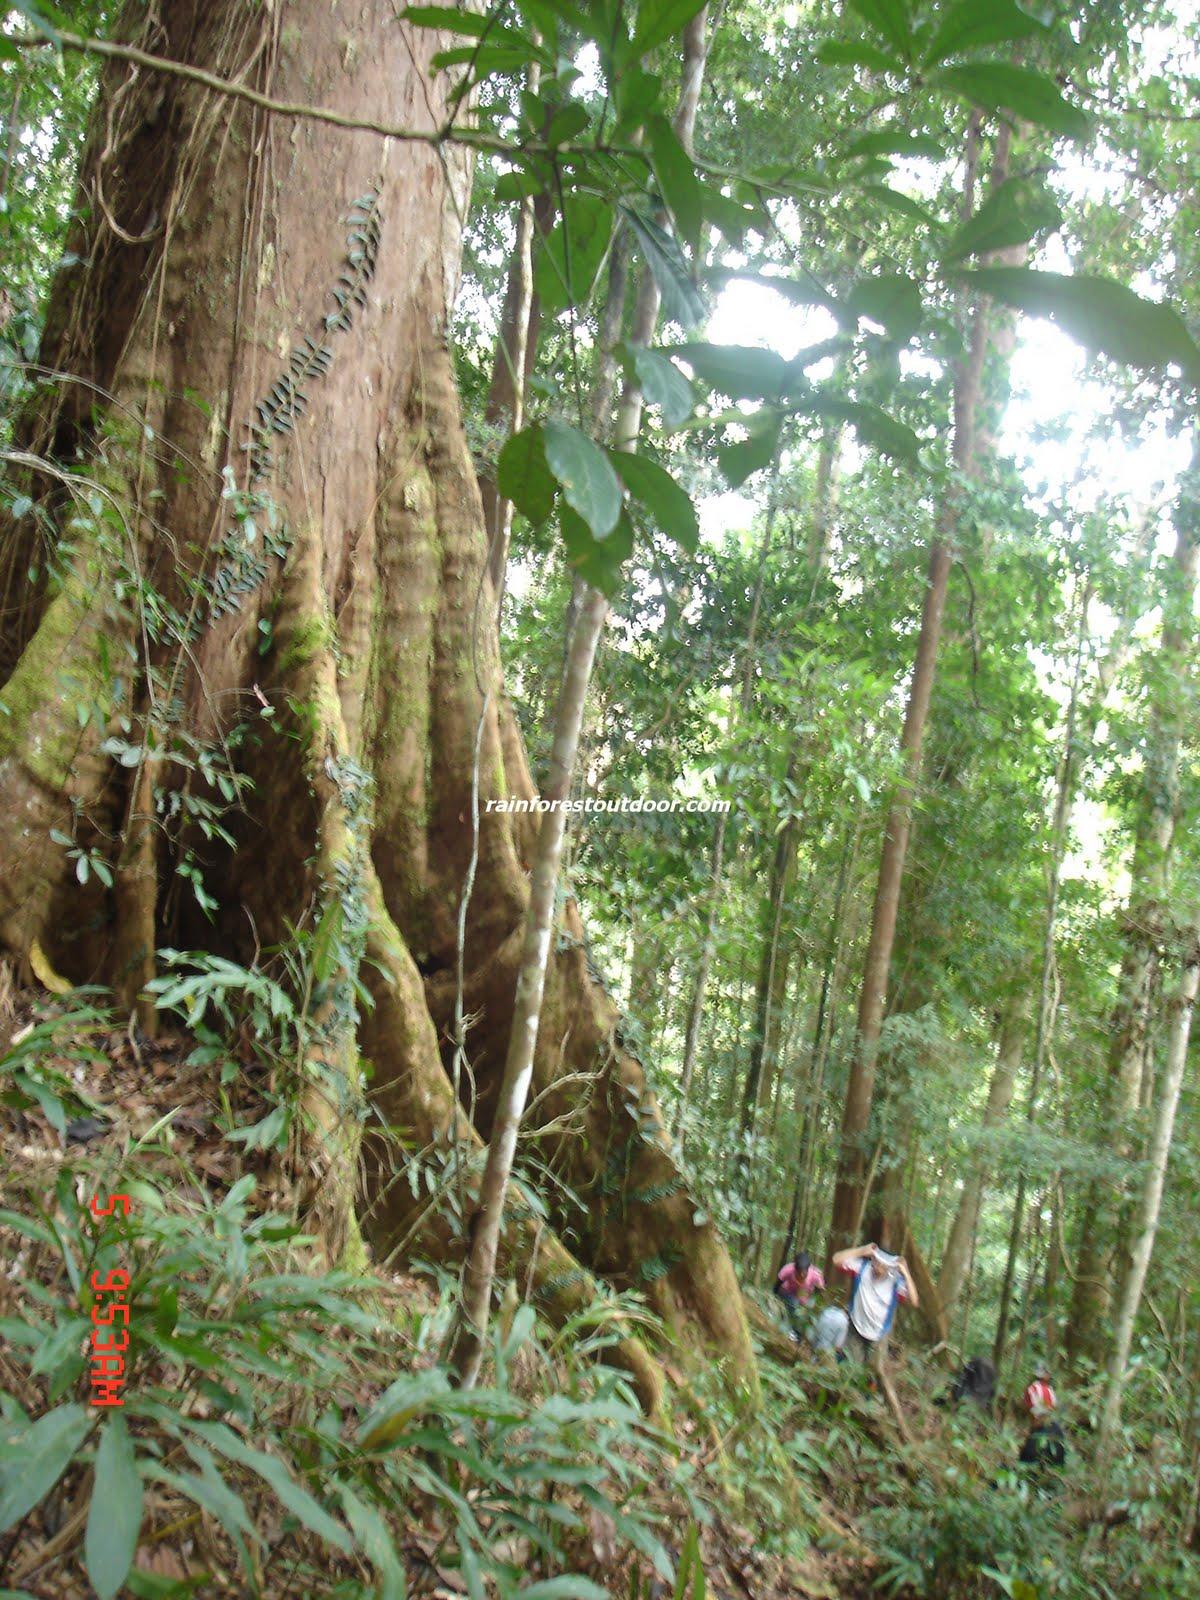 http://4.bp.blogspot.com/_0Pe-fAsXjvU/S-wpd536BYI/AAAAAAAAAhA/y4DIEgkmdDc/s1600/rainforest%25252525252Btree.jpg